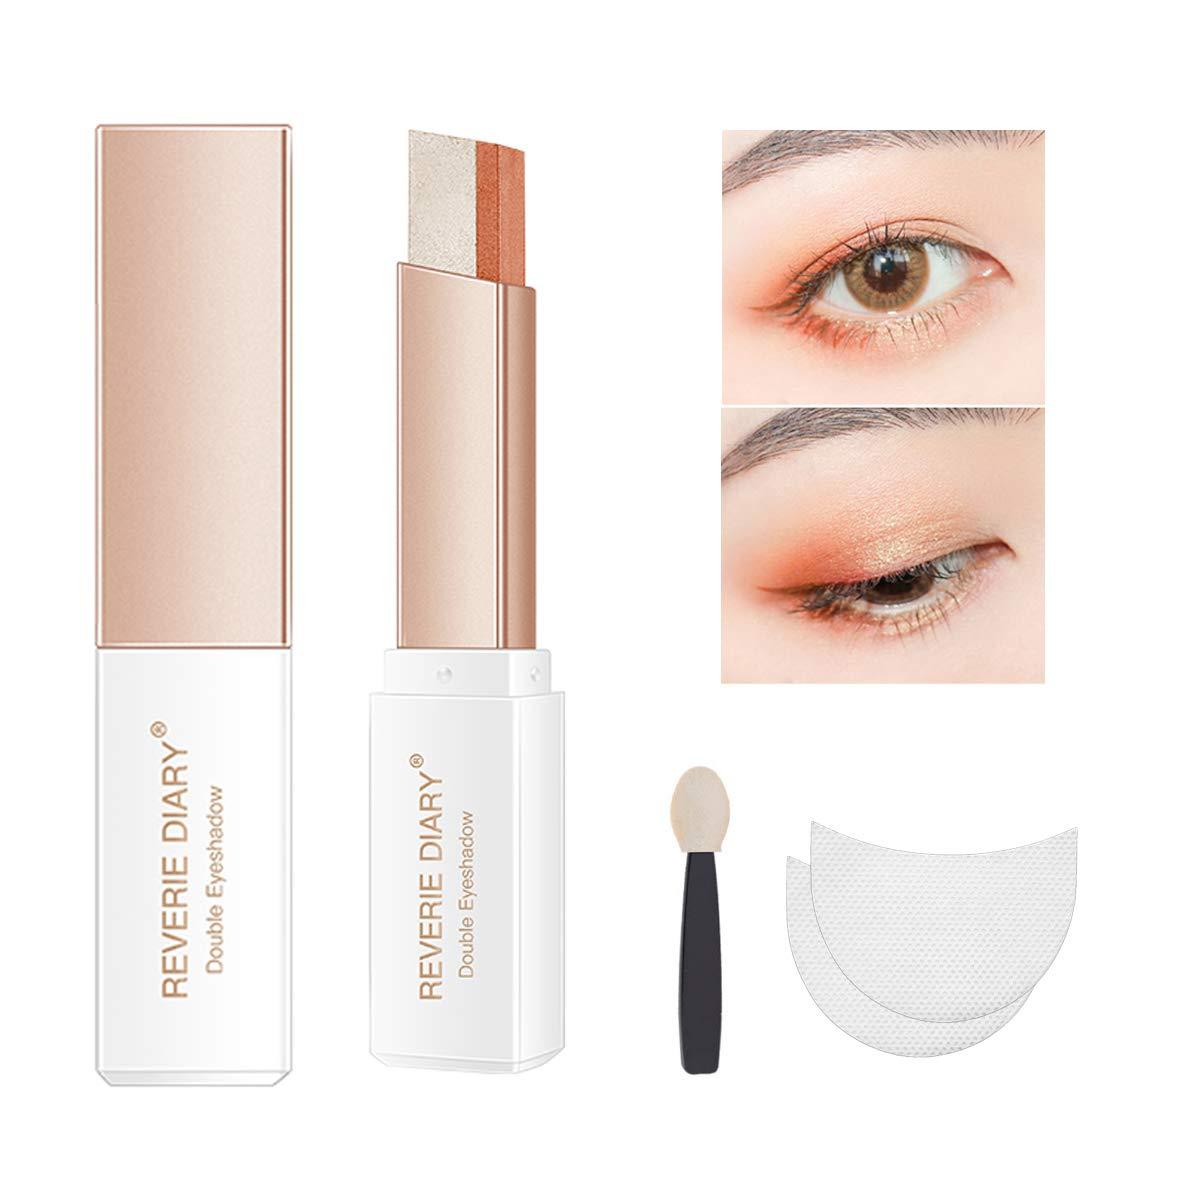 Three-piece eyeshadow stick eyeshadow prush eyeshadow sticker, eyeshadow stick two-color gradient glitter eye shadow pen rotating design, simple makeup, waterproof and not Blooming(Orange)